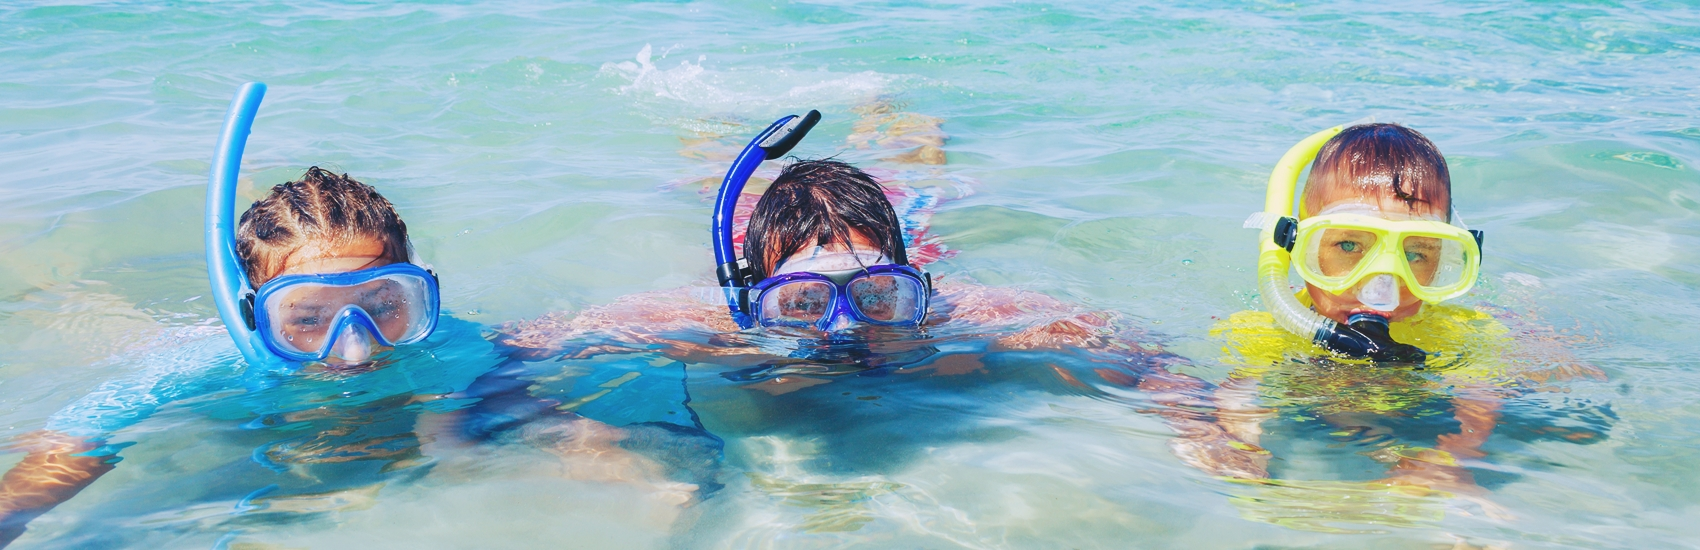 slider-nauticas-buceo-grupo